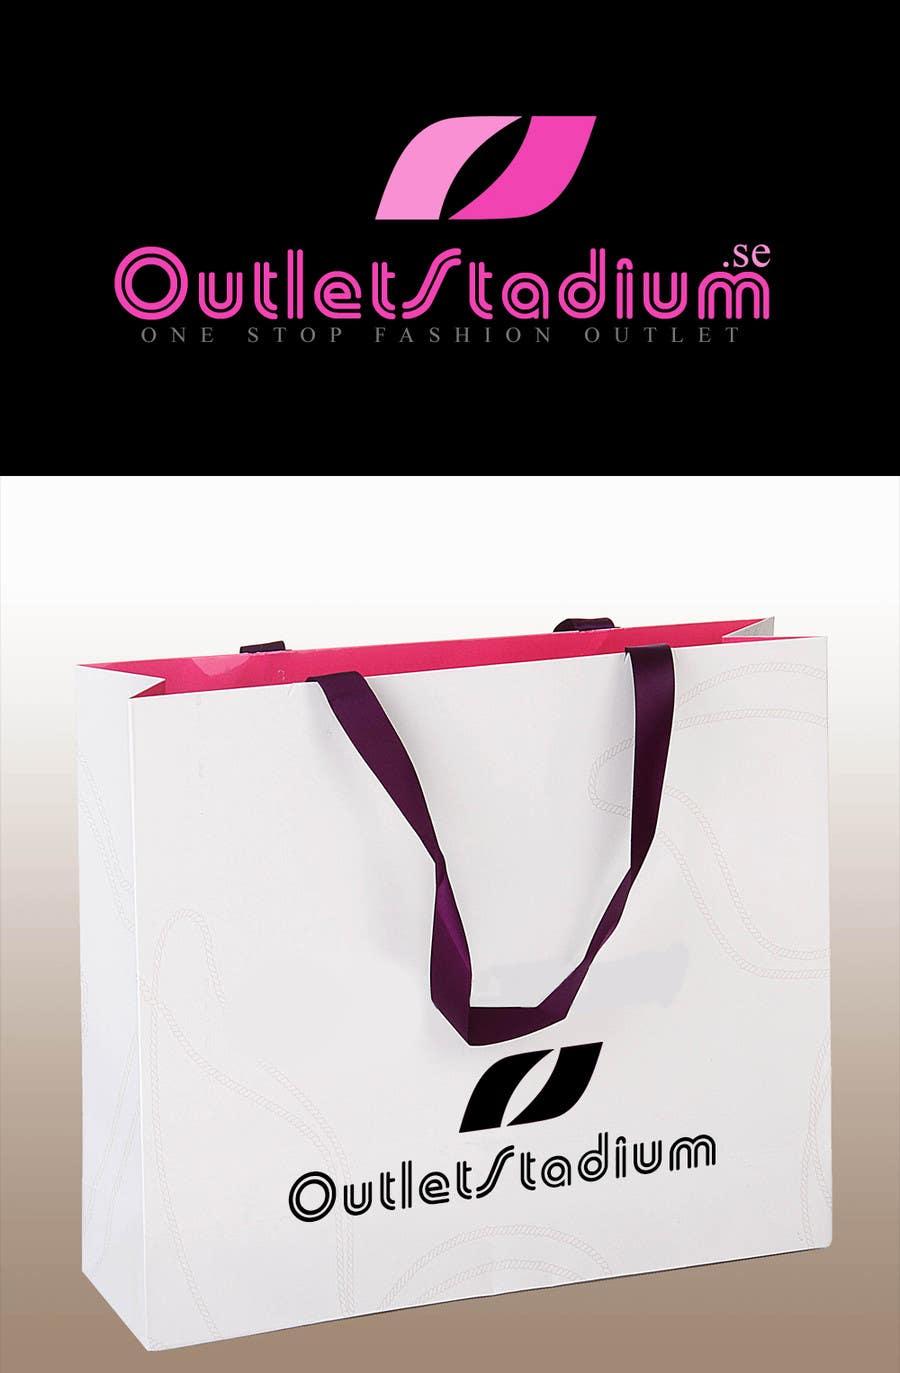 Proposition n°                                        14                                      du concours                                         Logo Design for OutletStadium.se